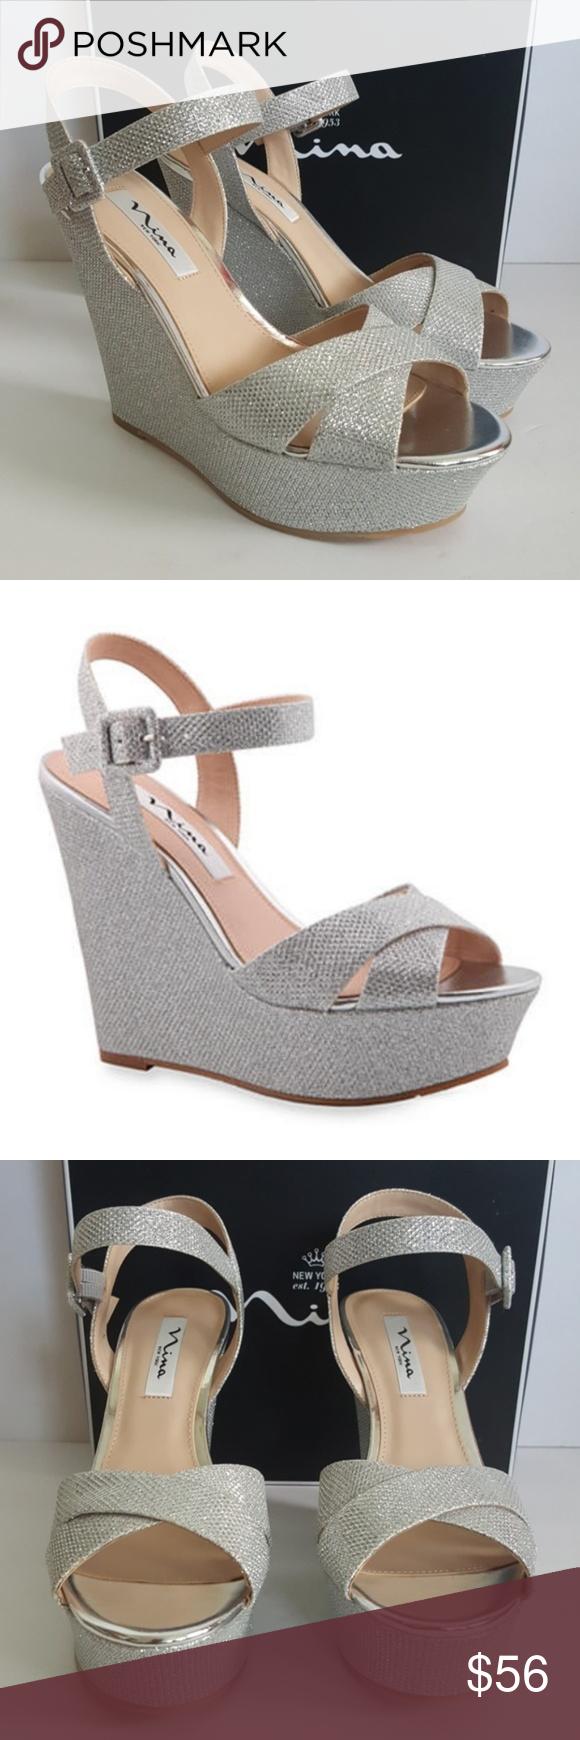 ed996d89d88 New Nina Jinjer Wedge Sandals New.. never worn 5